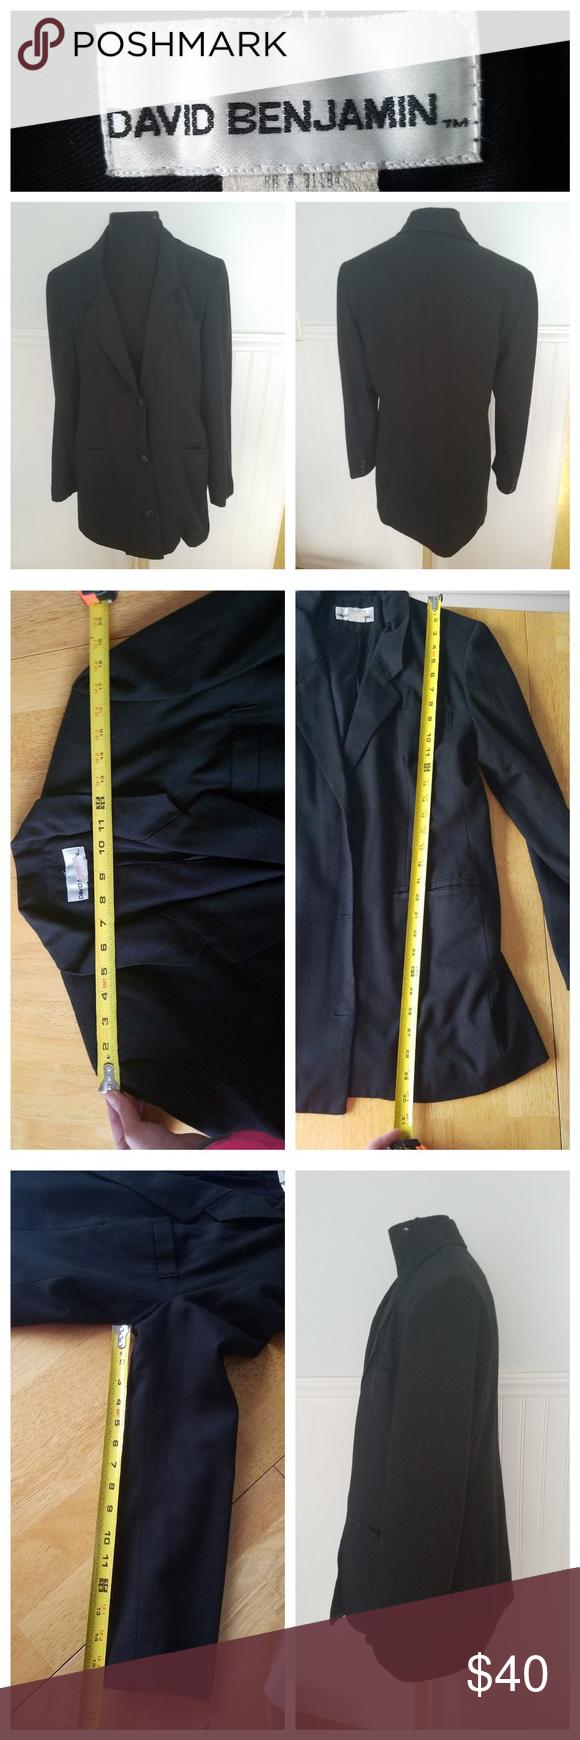 4e5ca3257859 David Benjamin Black Blazer - Sz. 10 This is a David Benjamin brand black  blazer